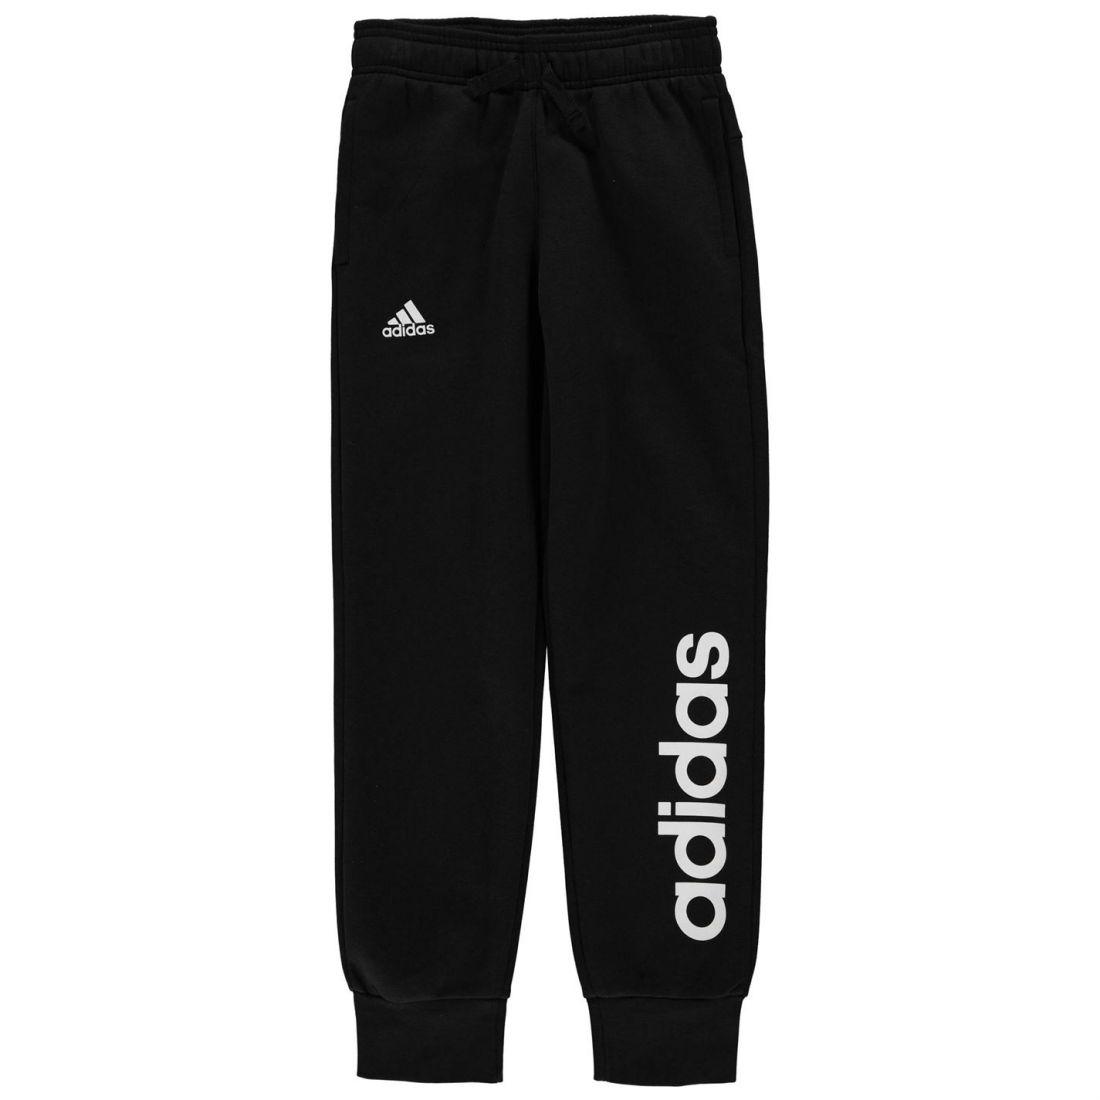 fe5653e9de31 Image is loading adidas-Linear-Jogging-Pants-Youngster-Girls-Fleece-Bottoms-